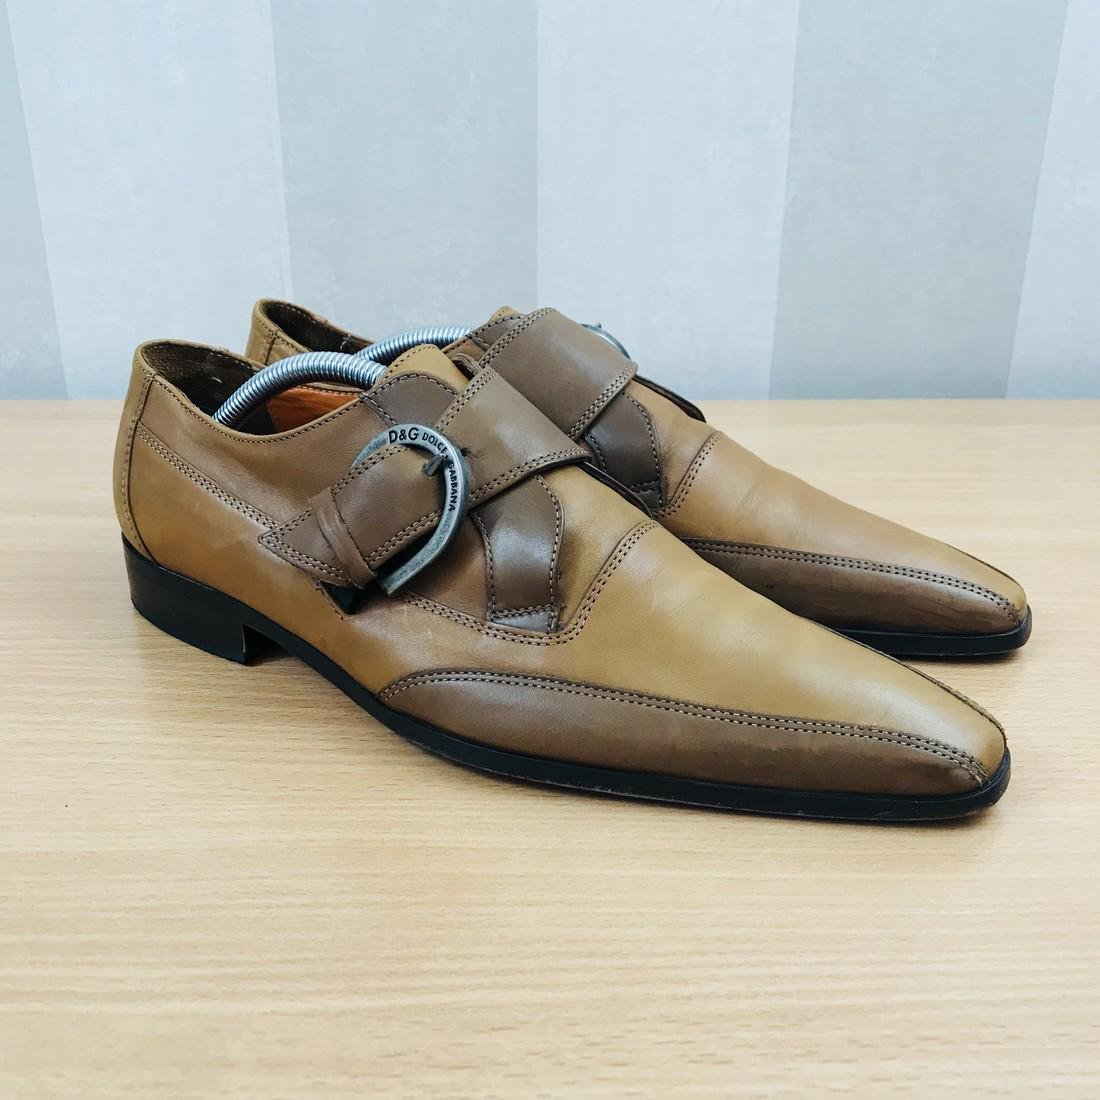 Dolce & Gabbana – Leather Shoes Size EUR 42 UK 8.5 US 9 - 2